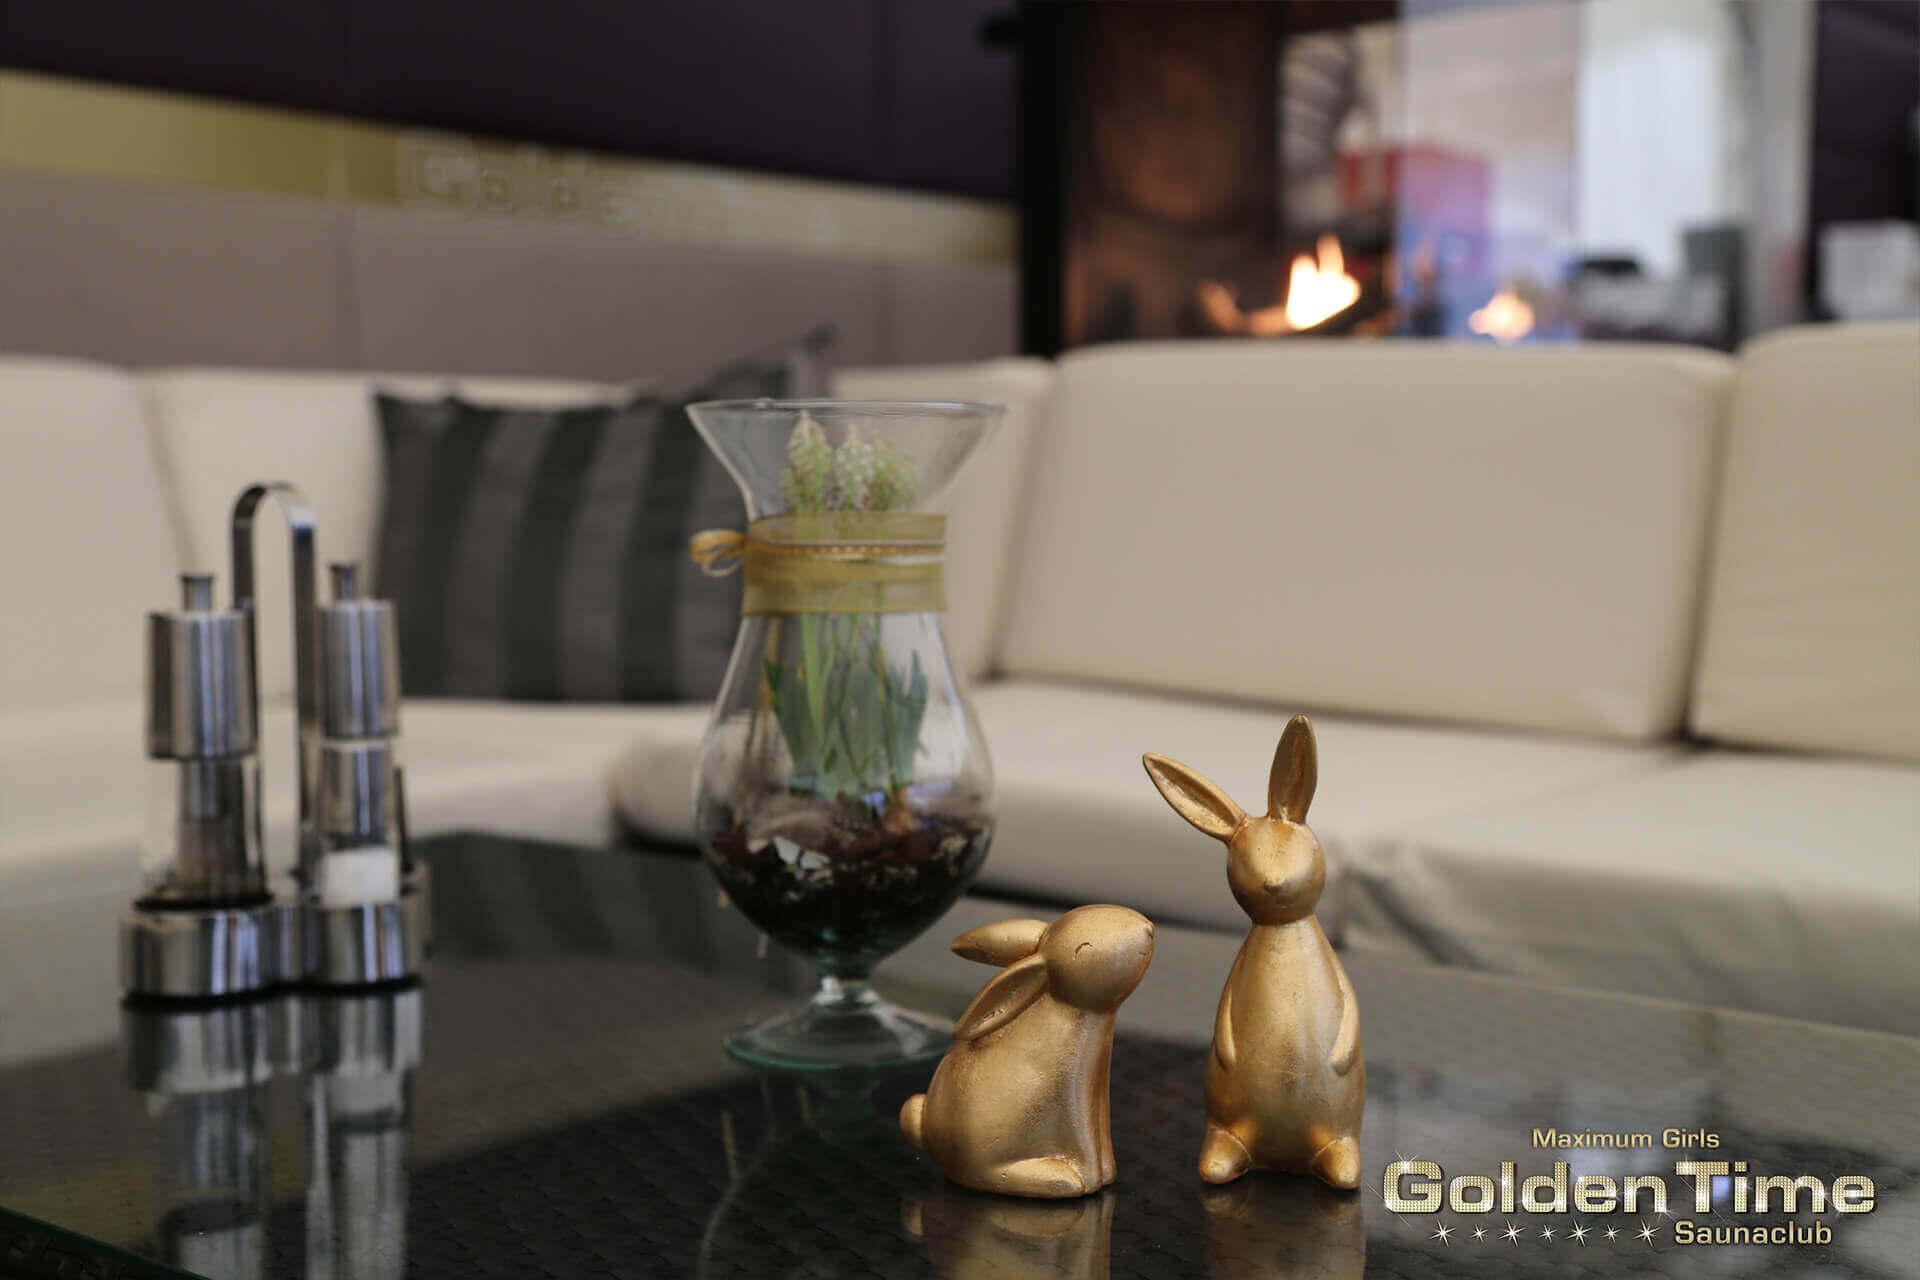 02-ostern-2016-pic-26-goldentime-saunaclub.jpg